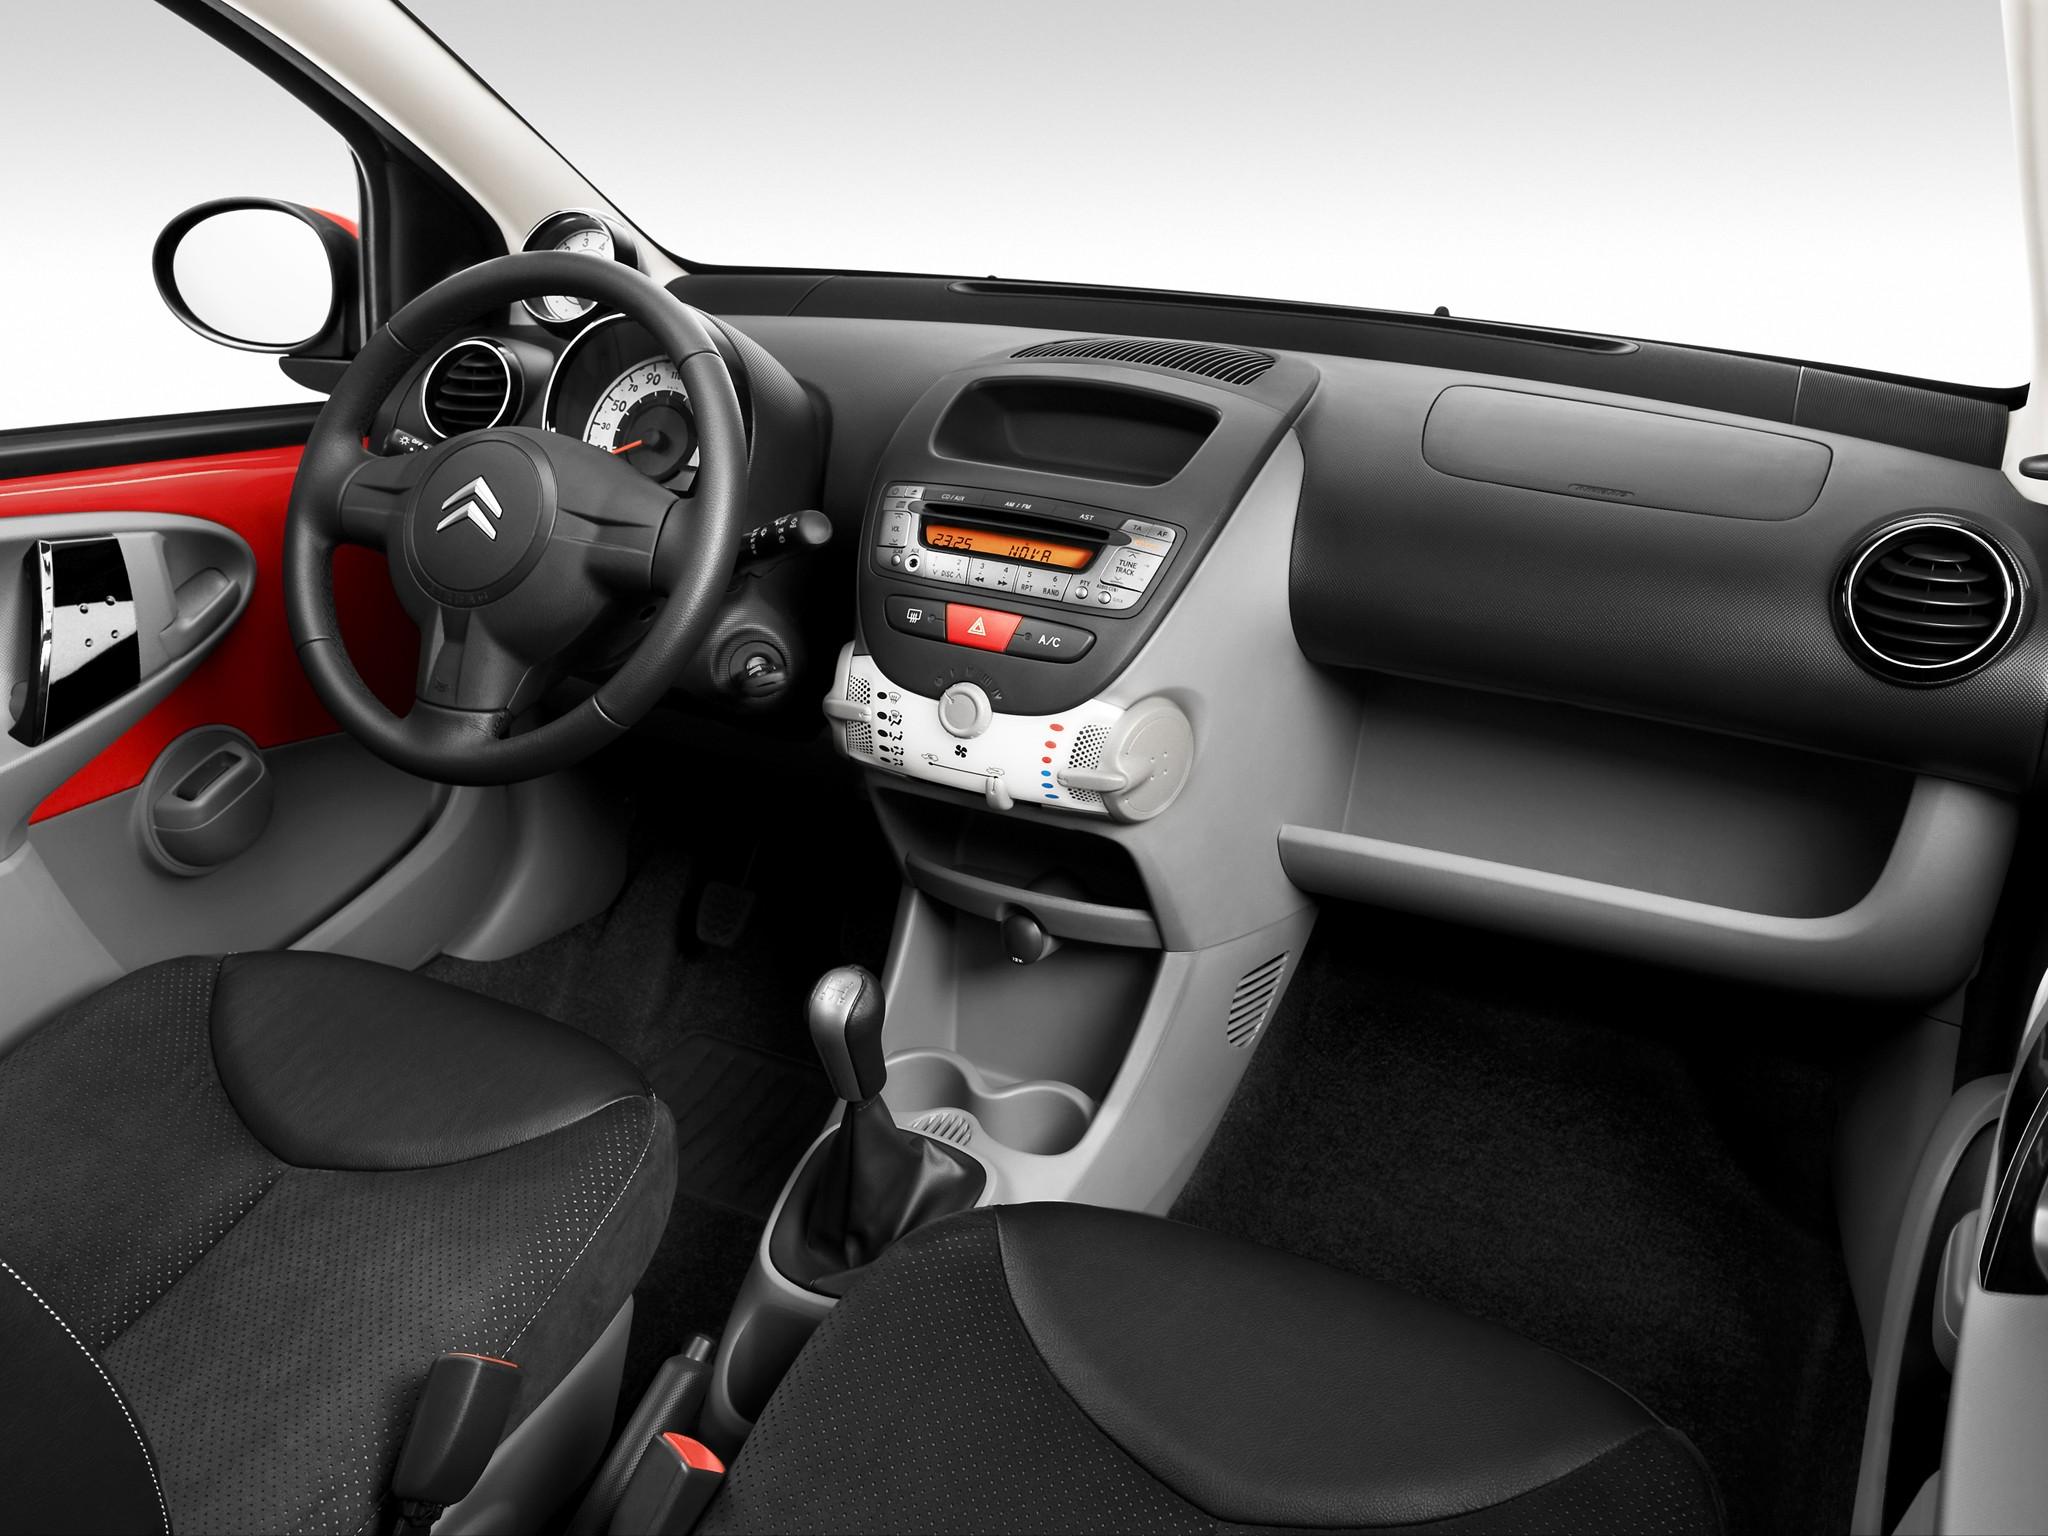 Citroen c1 5 doors specs 2009 2010 2011 2012 for Interiores 2016